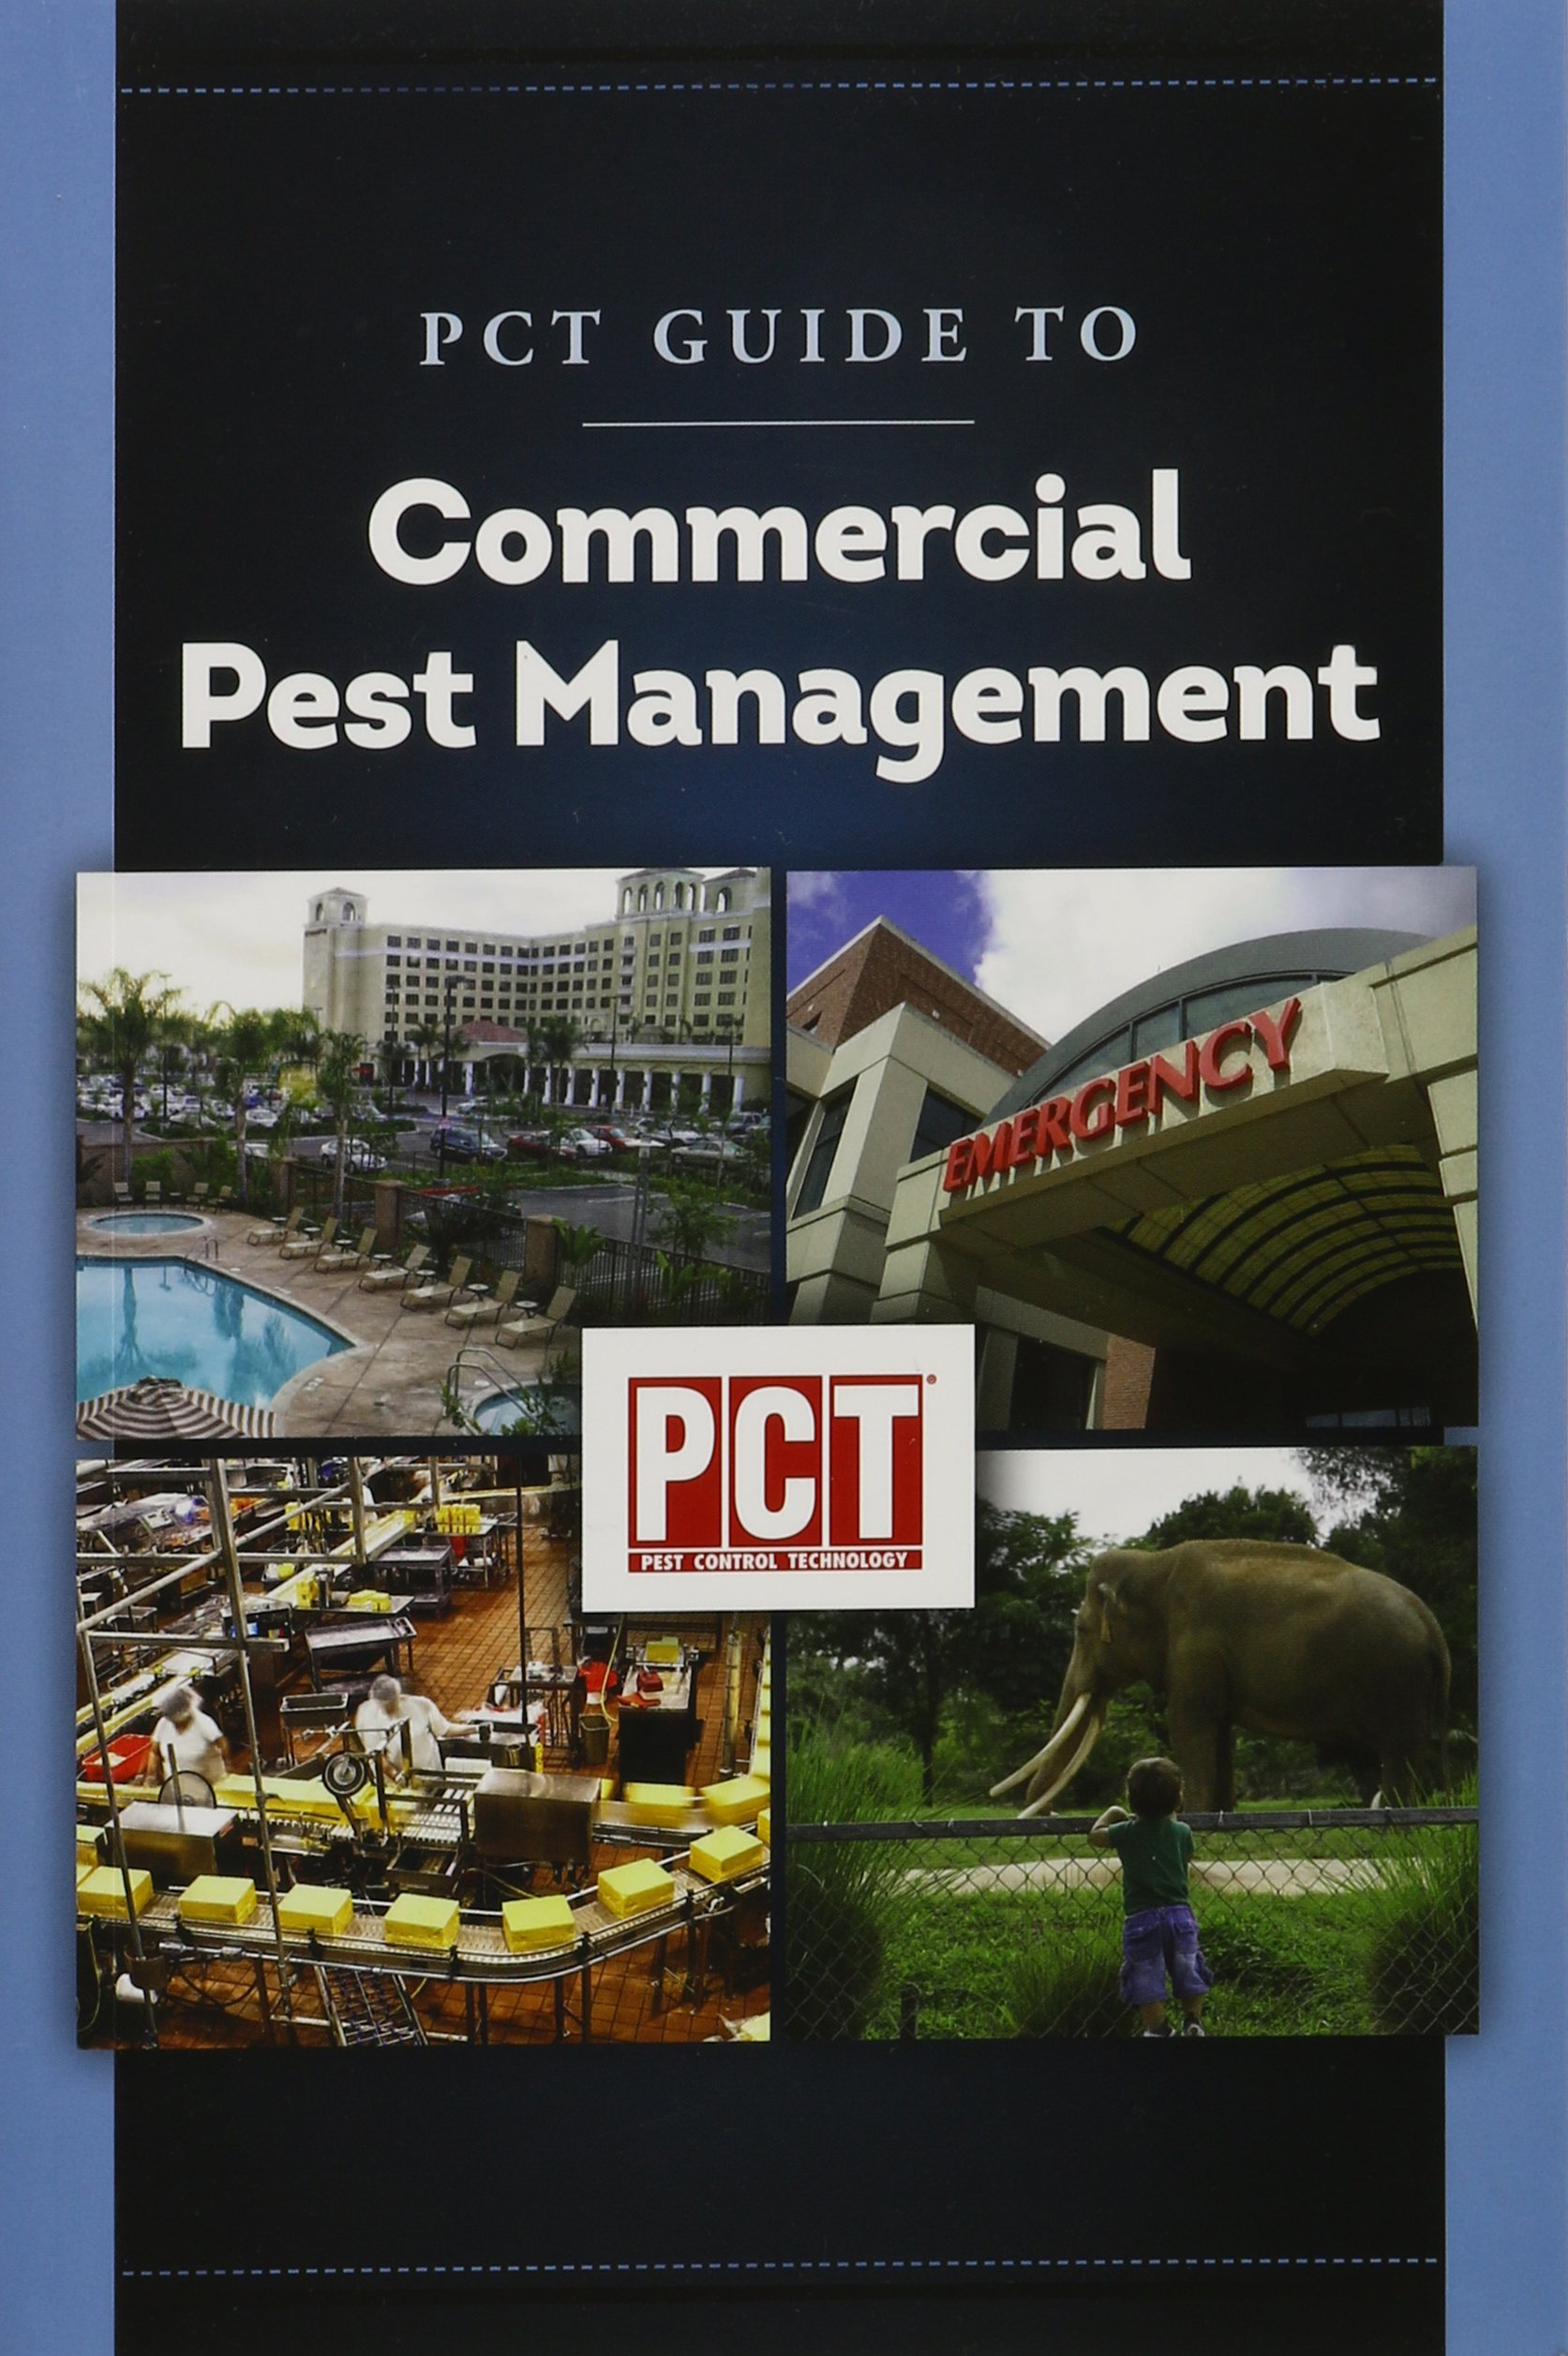 Opnavinst 6250. 4b: pest management programs navy medicine.